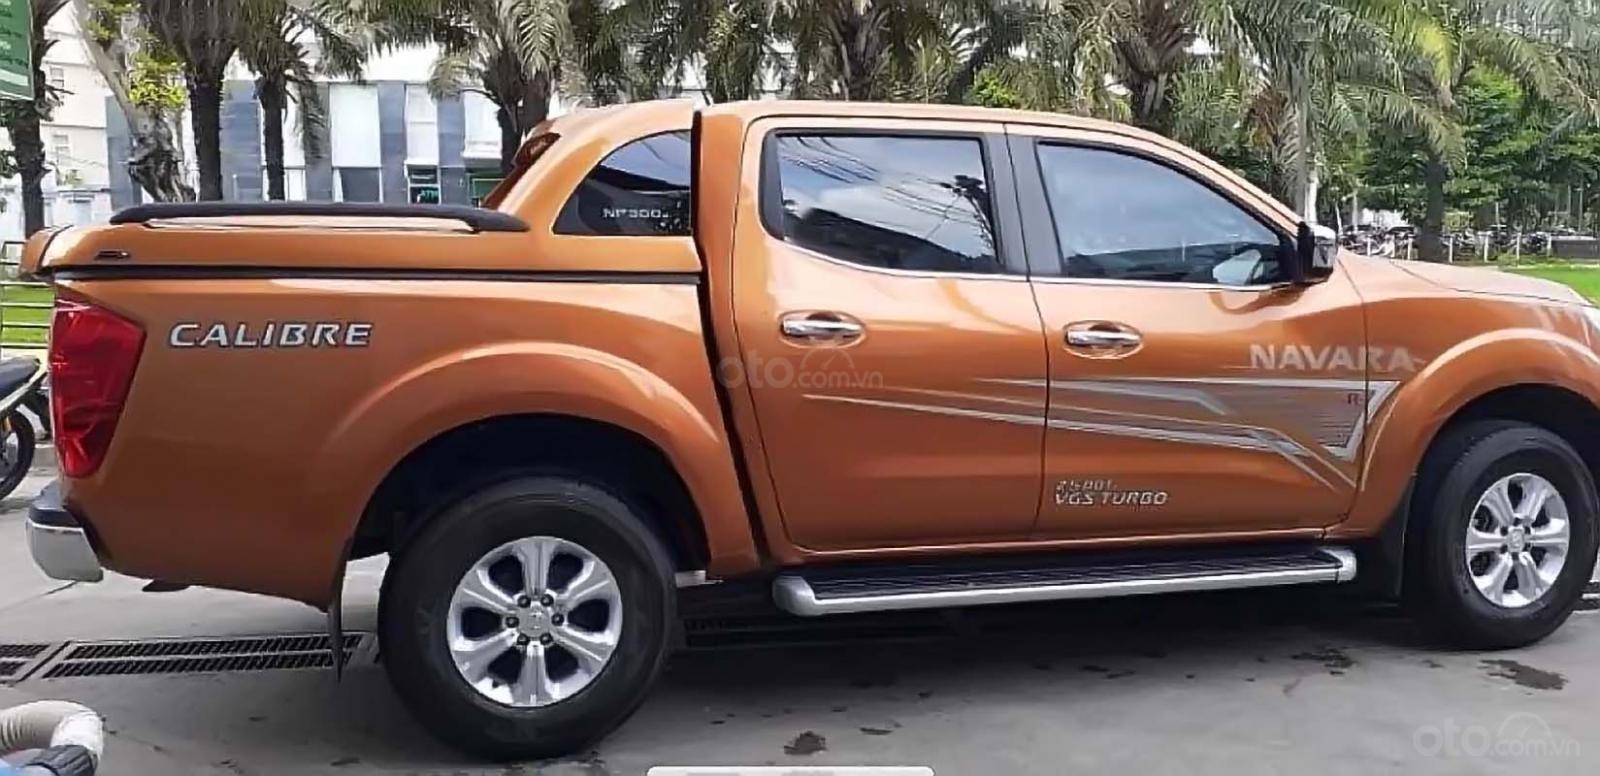 Bán xe Nissan Navara El Premium R đời 2018, nhập khẩu (1)